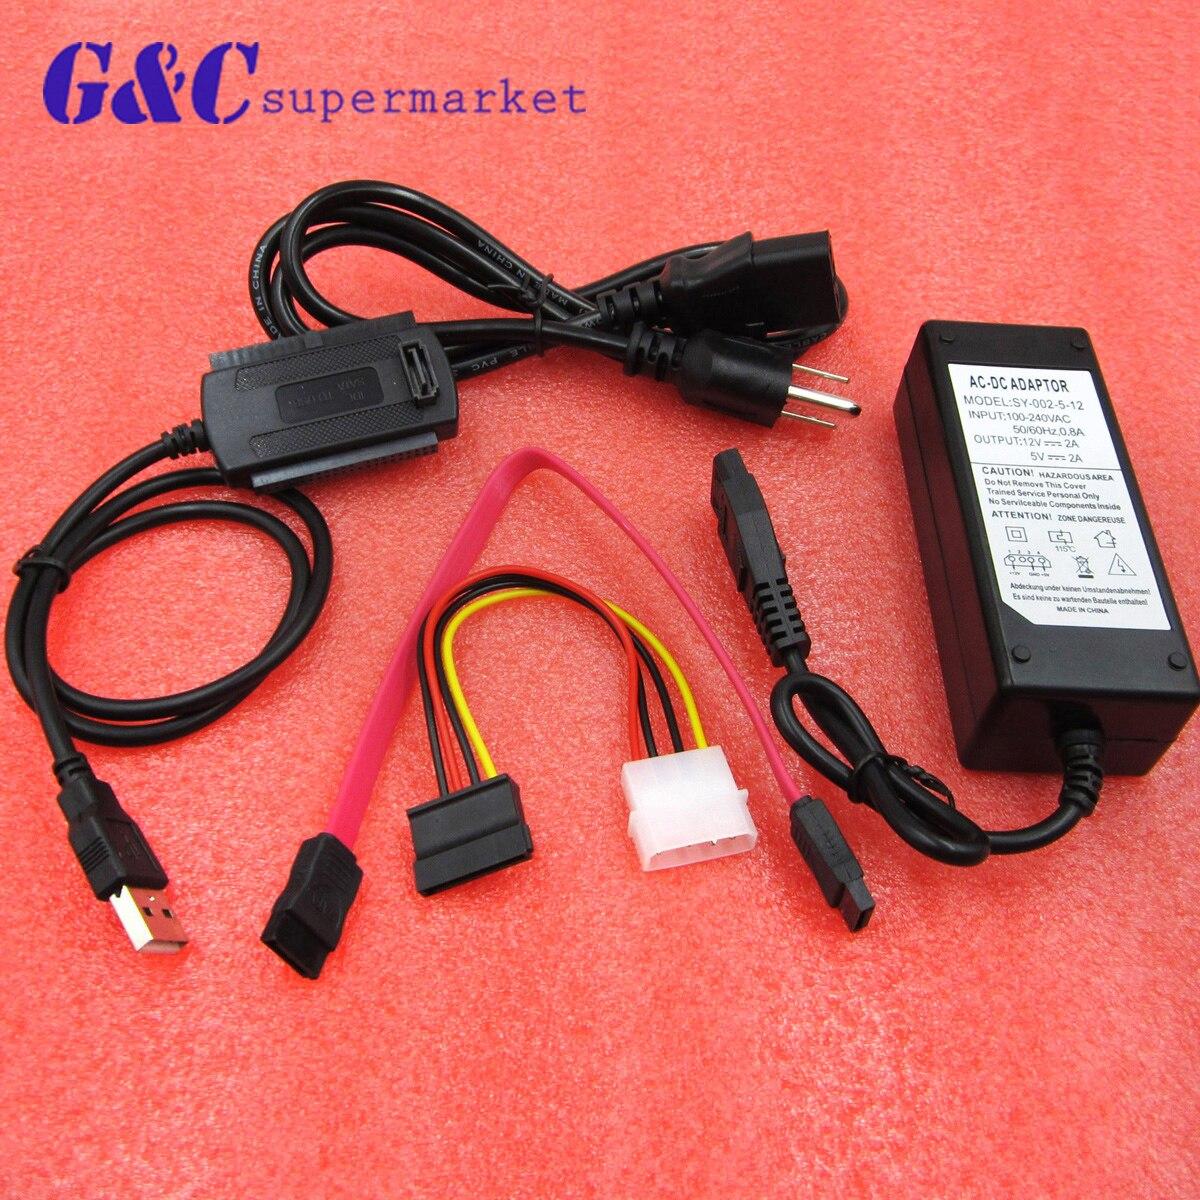 USB 2.0 A IDE SATA S-ATA 2.5 3.5 Disco Duro HD HDD Adaptador Convertidor Nuevo MOSUNX Futural Digital Venta Caliente F35